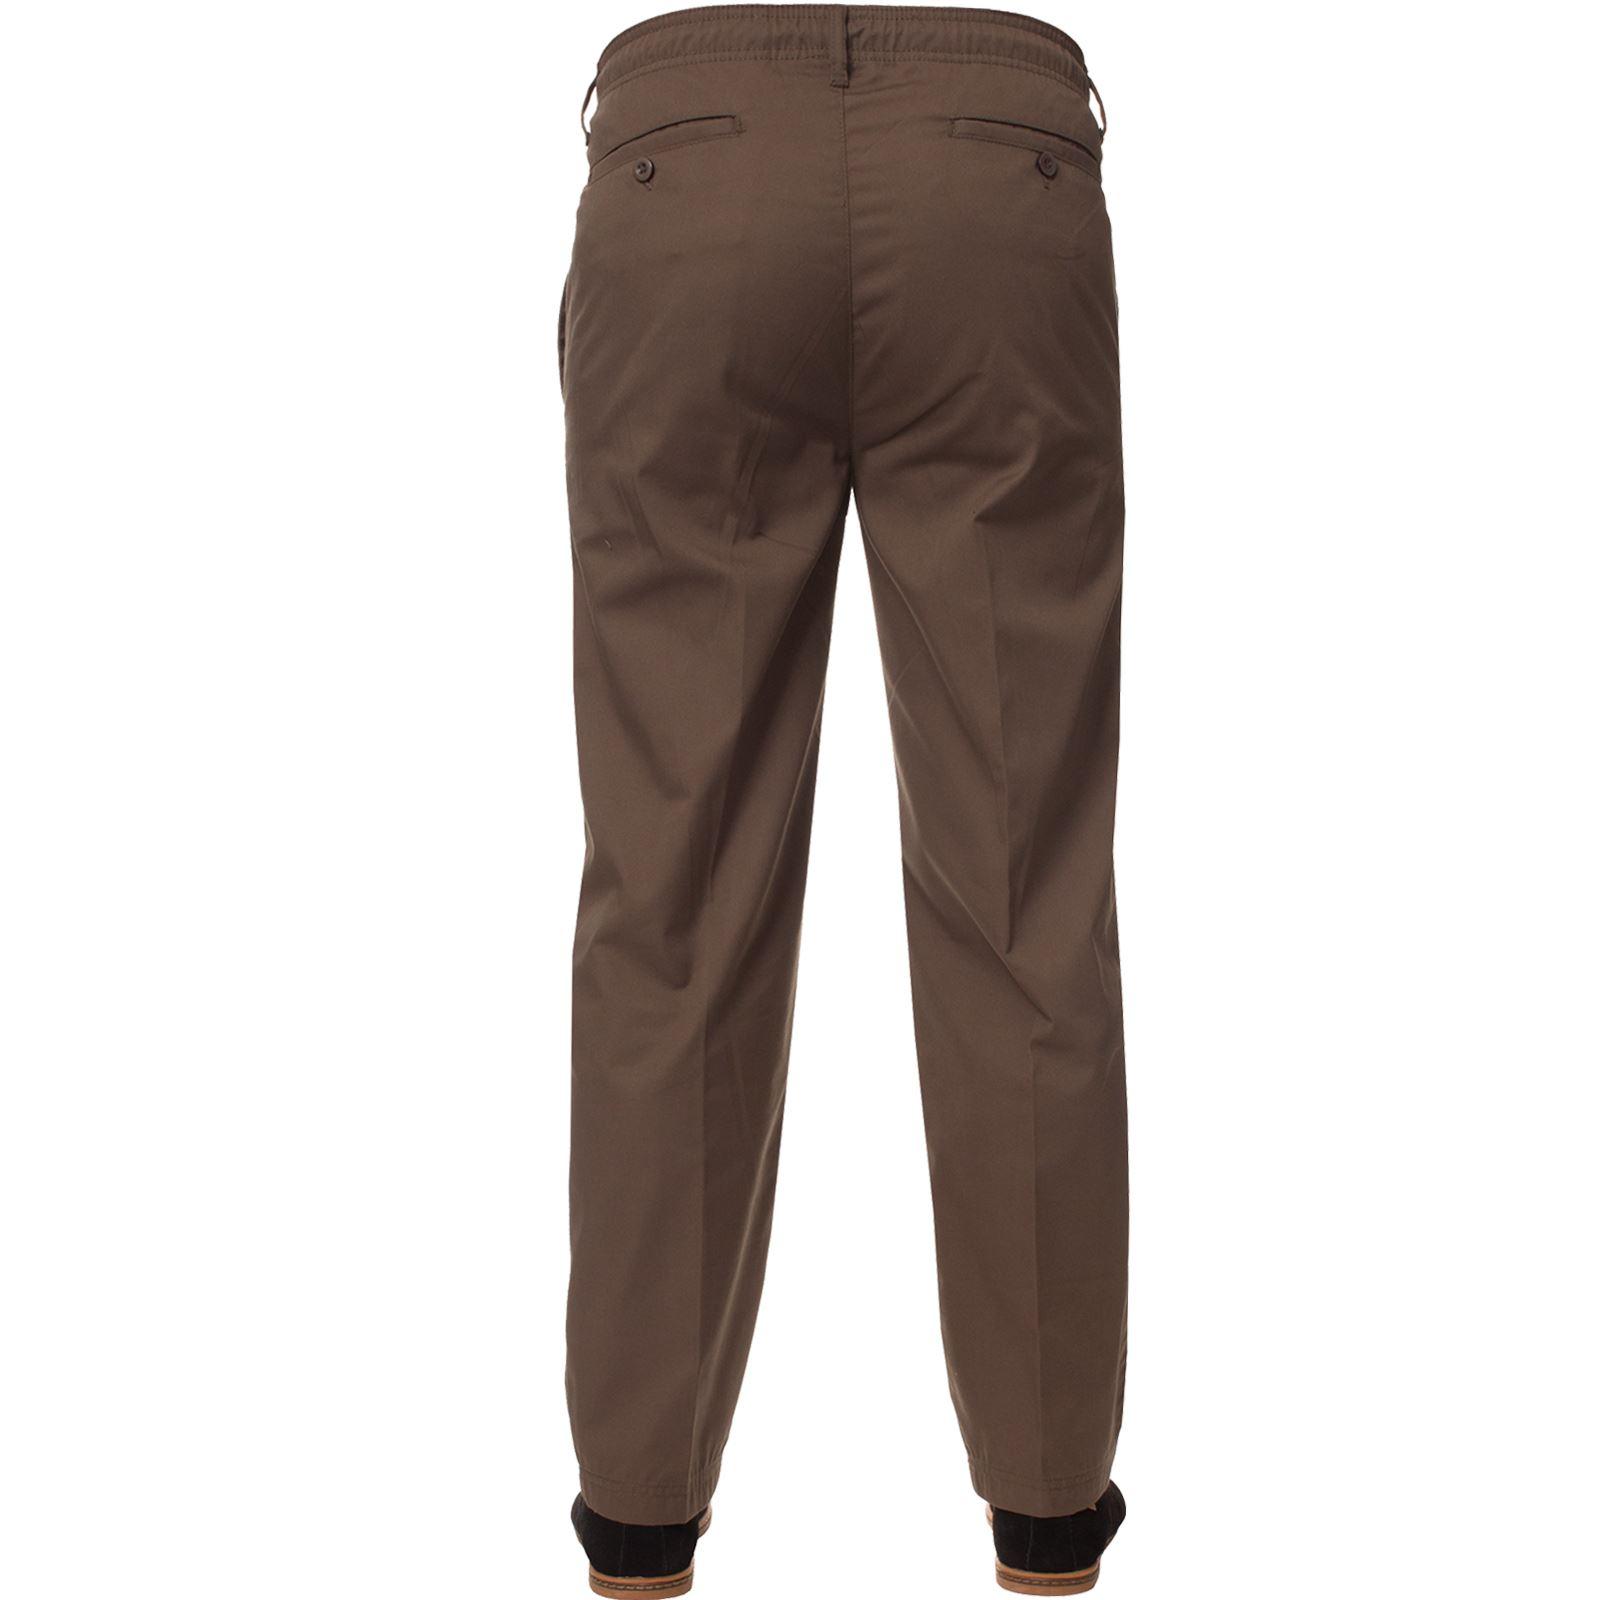 Para-Hombres-Pantalones-De-Rugby-Kruze-cintura-elastica-con-cordon-pantalones-REGULAR-King-Tamanos miniatura 14